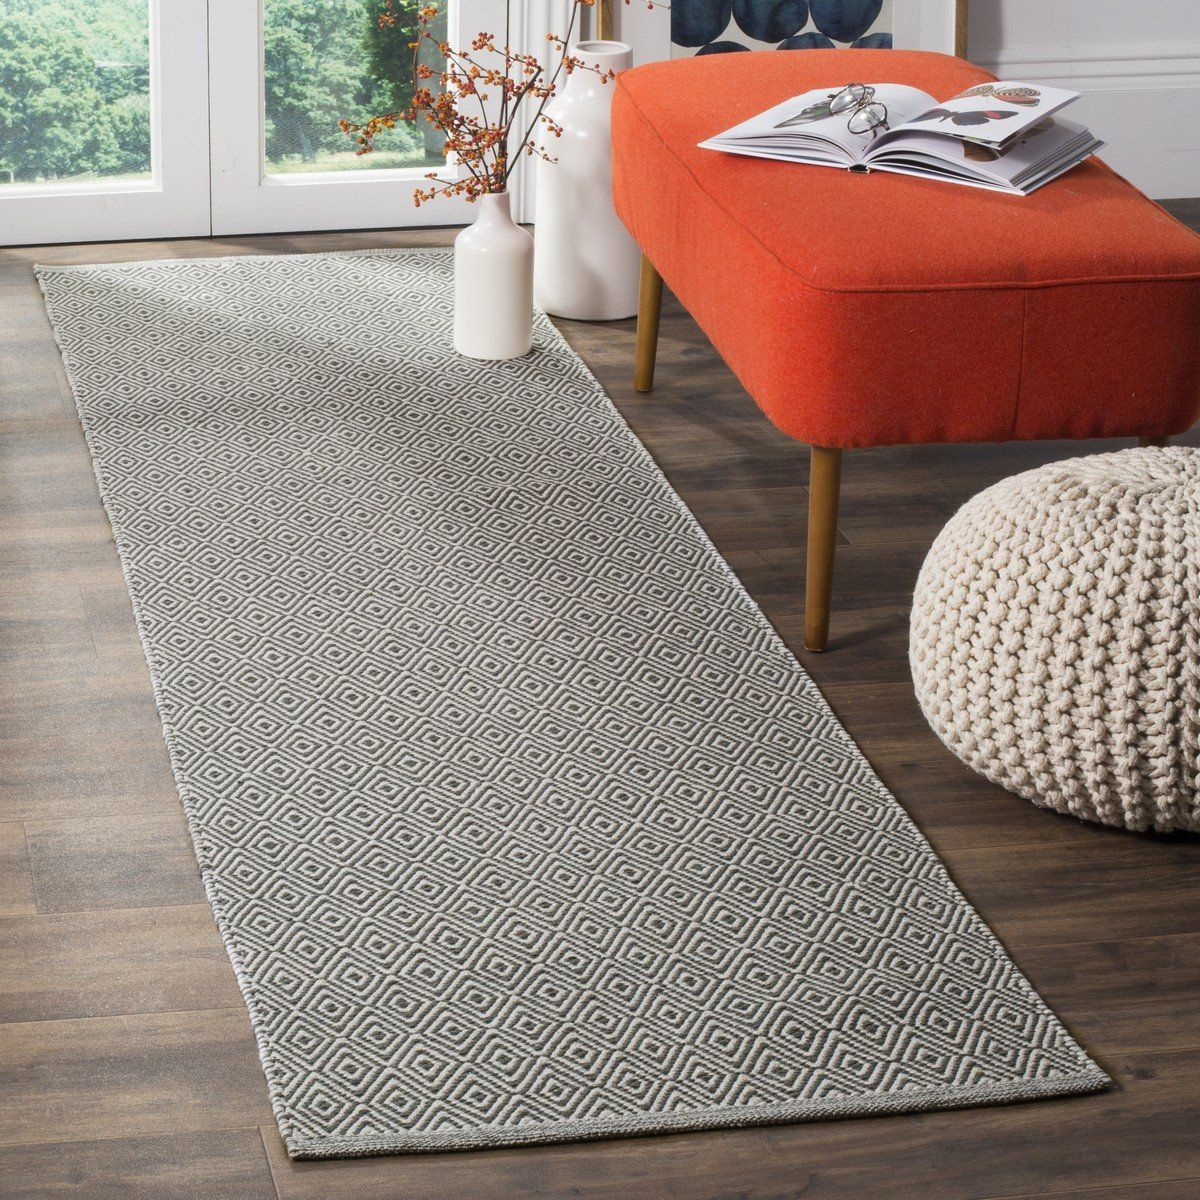 Safavieh Montauk MTK515C Ivory / Grey Rug Colorful rugs